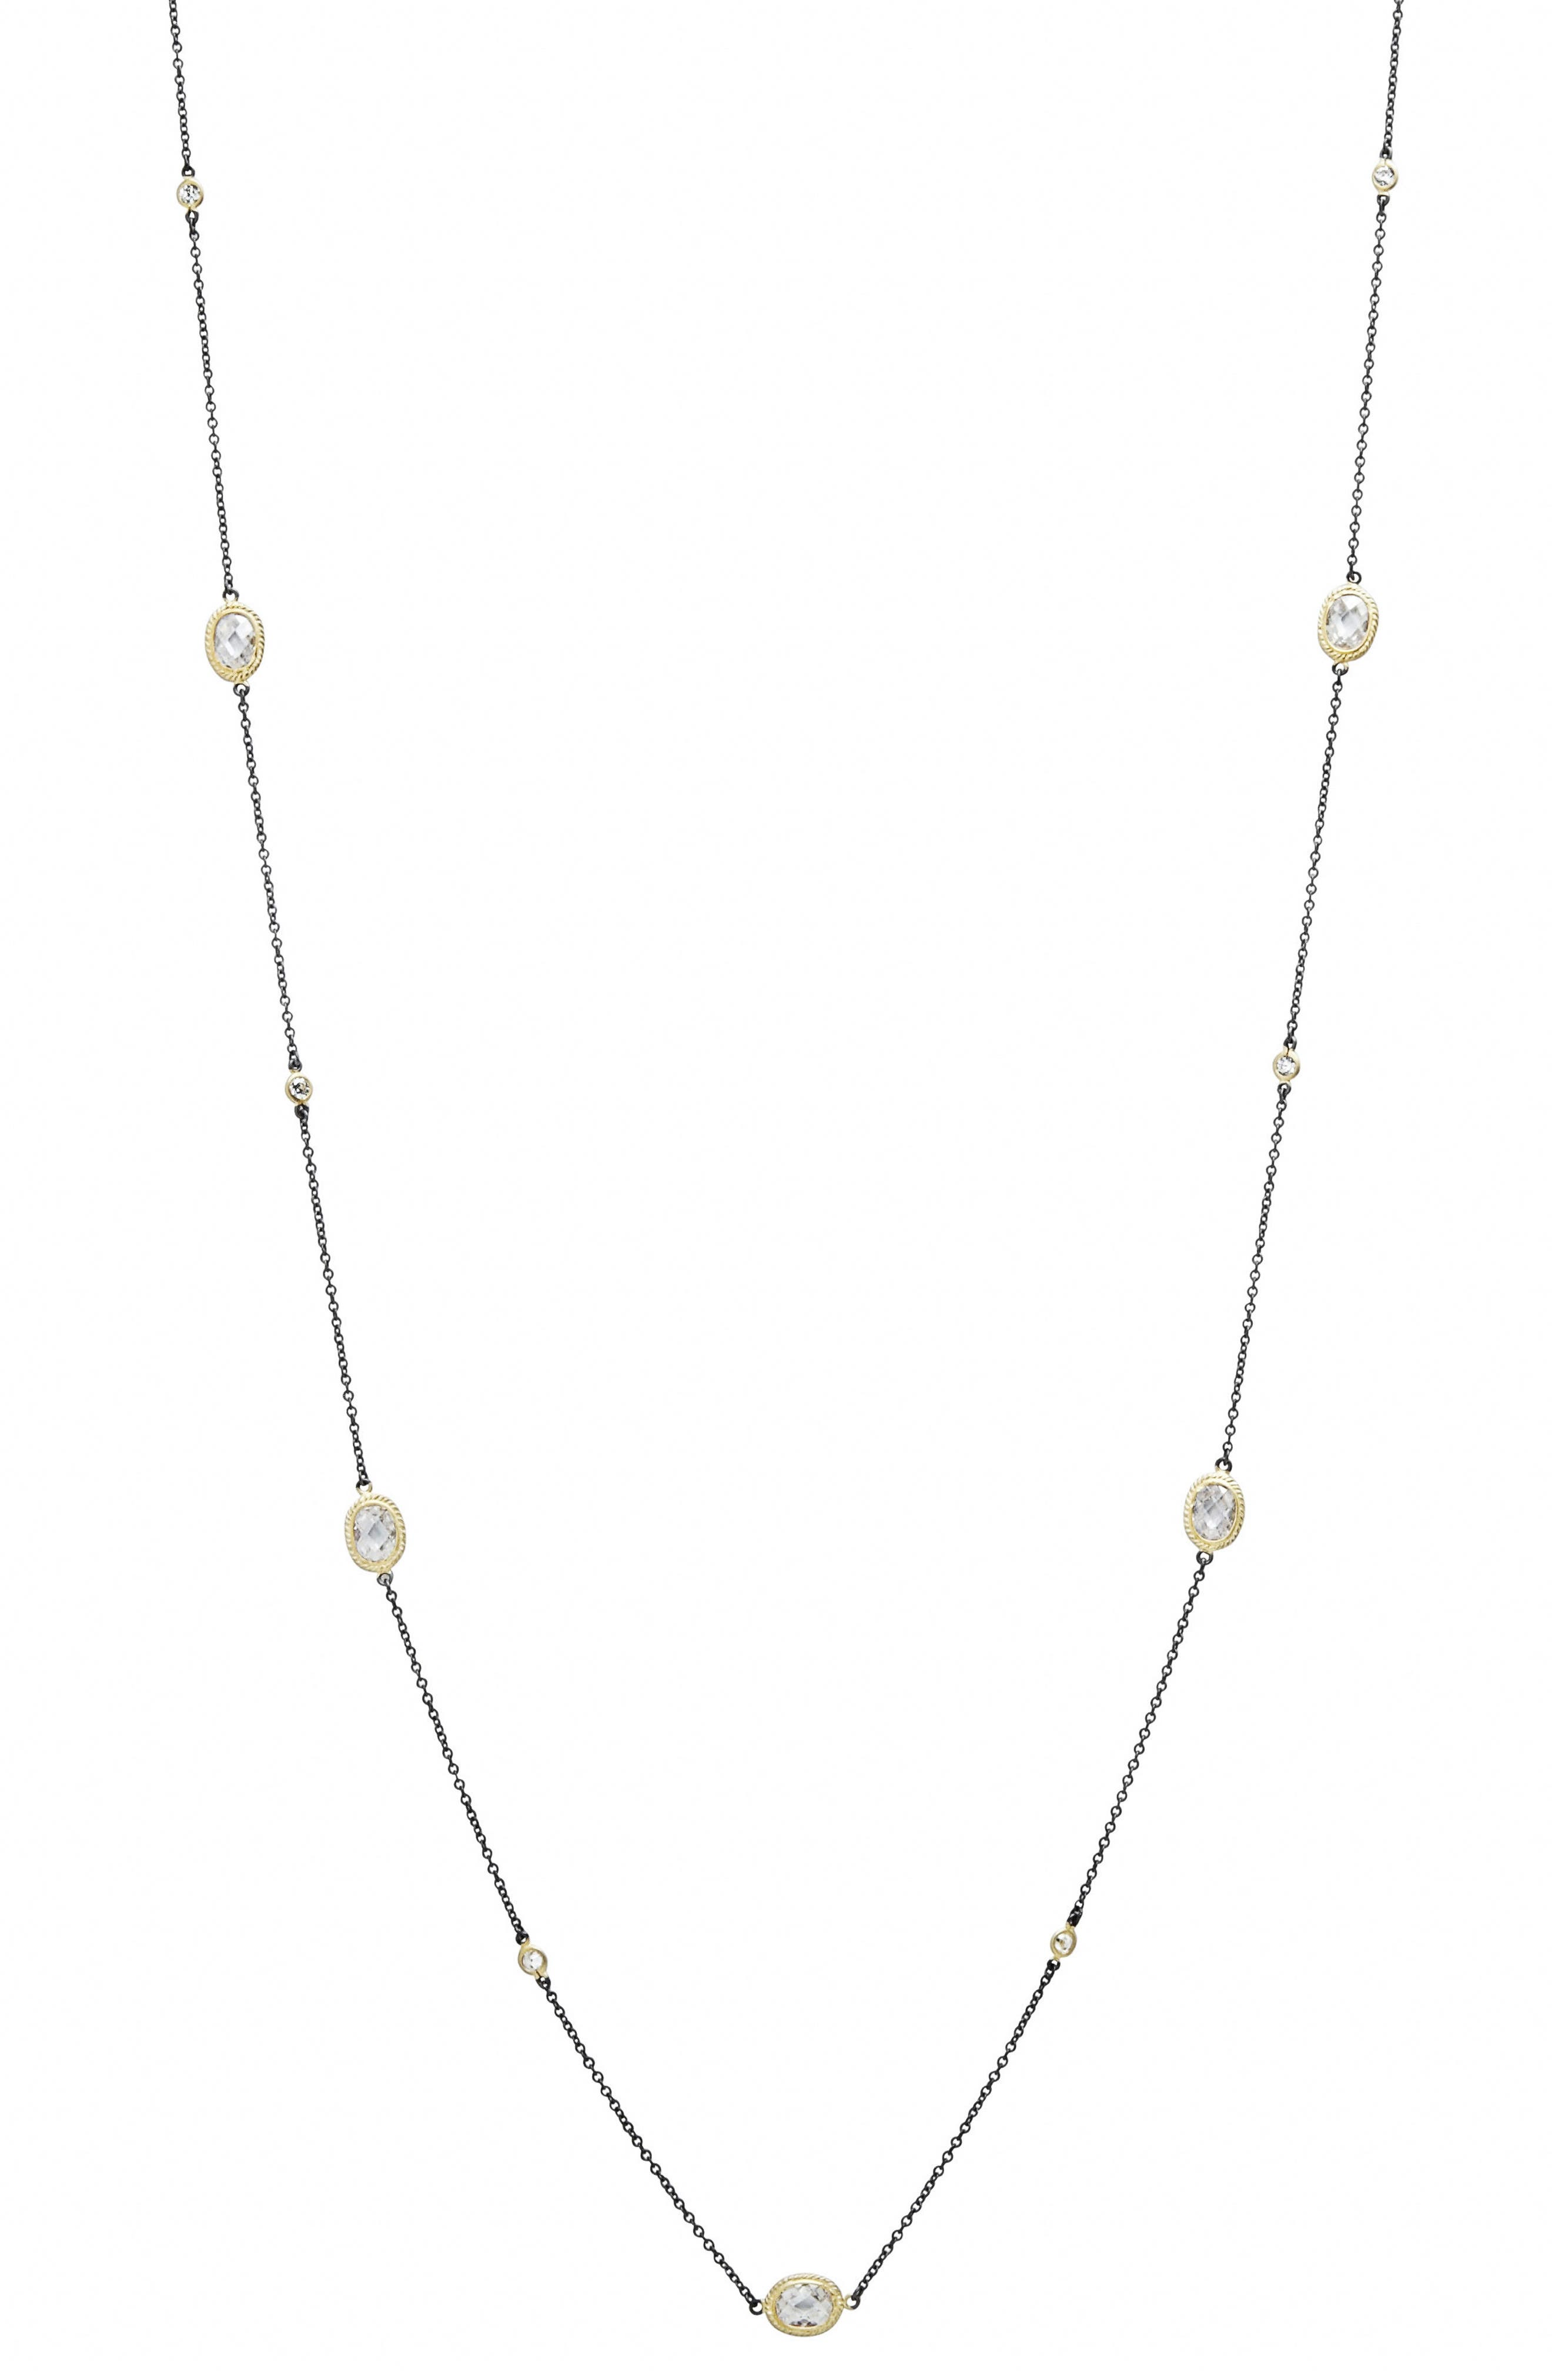 Signature Radiance Wrap Necklace,                             Main thumbnail 1, color,                             GOLD/ BLACK